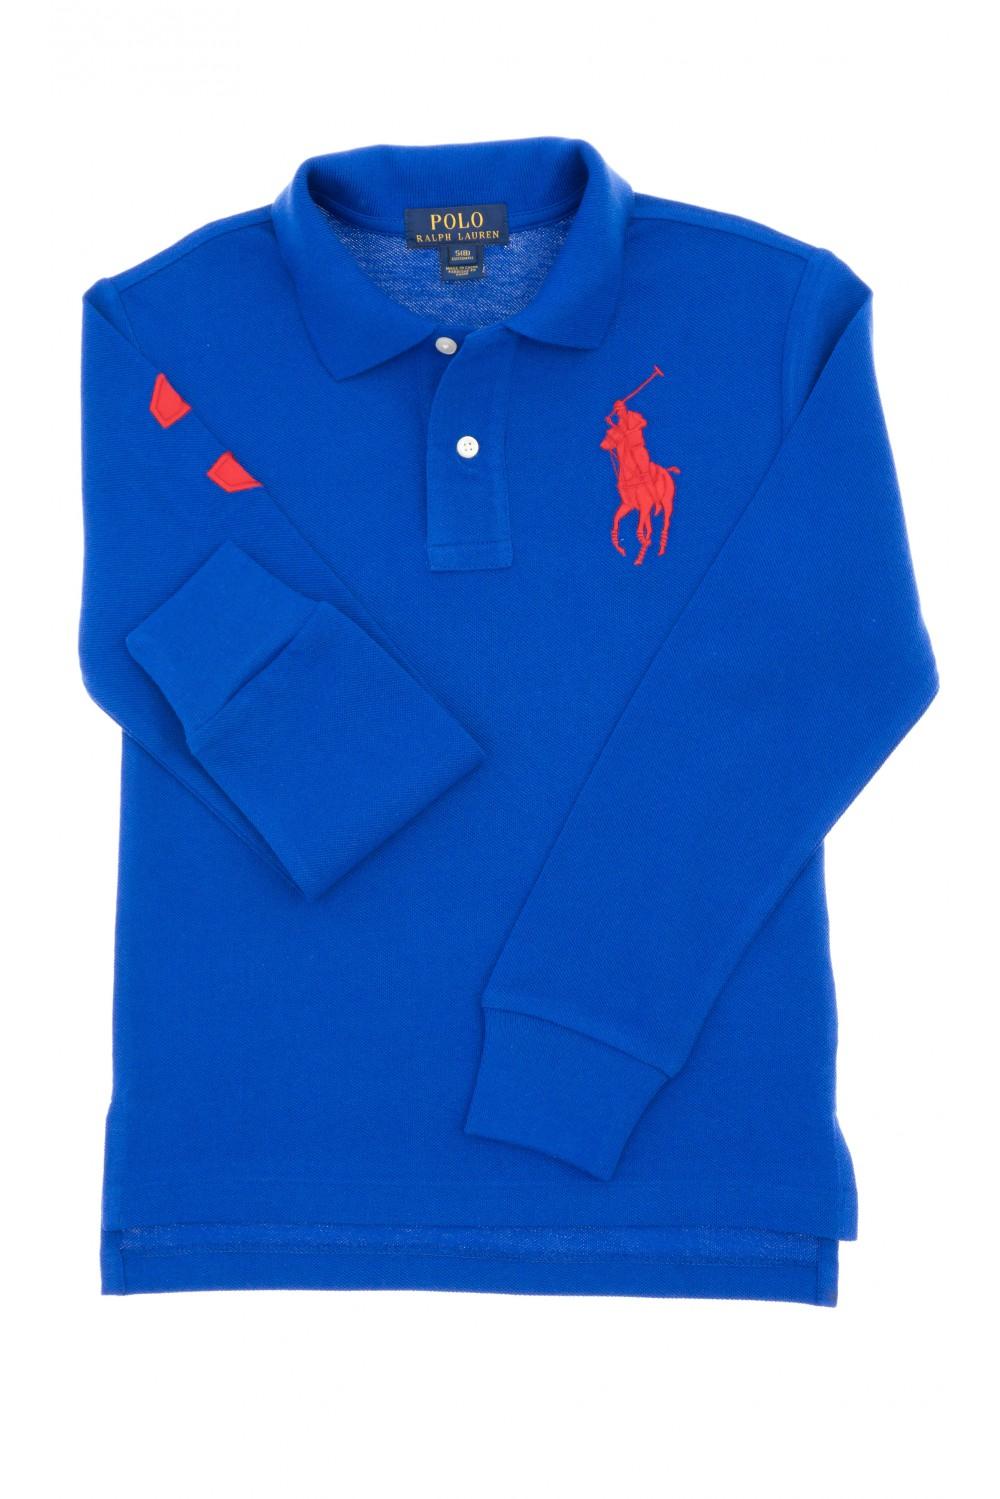 Sapphire long sleeved boy s polo shirt polo ralph lauren for Long sleeved polo shirts for boys